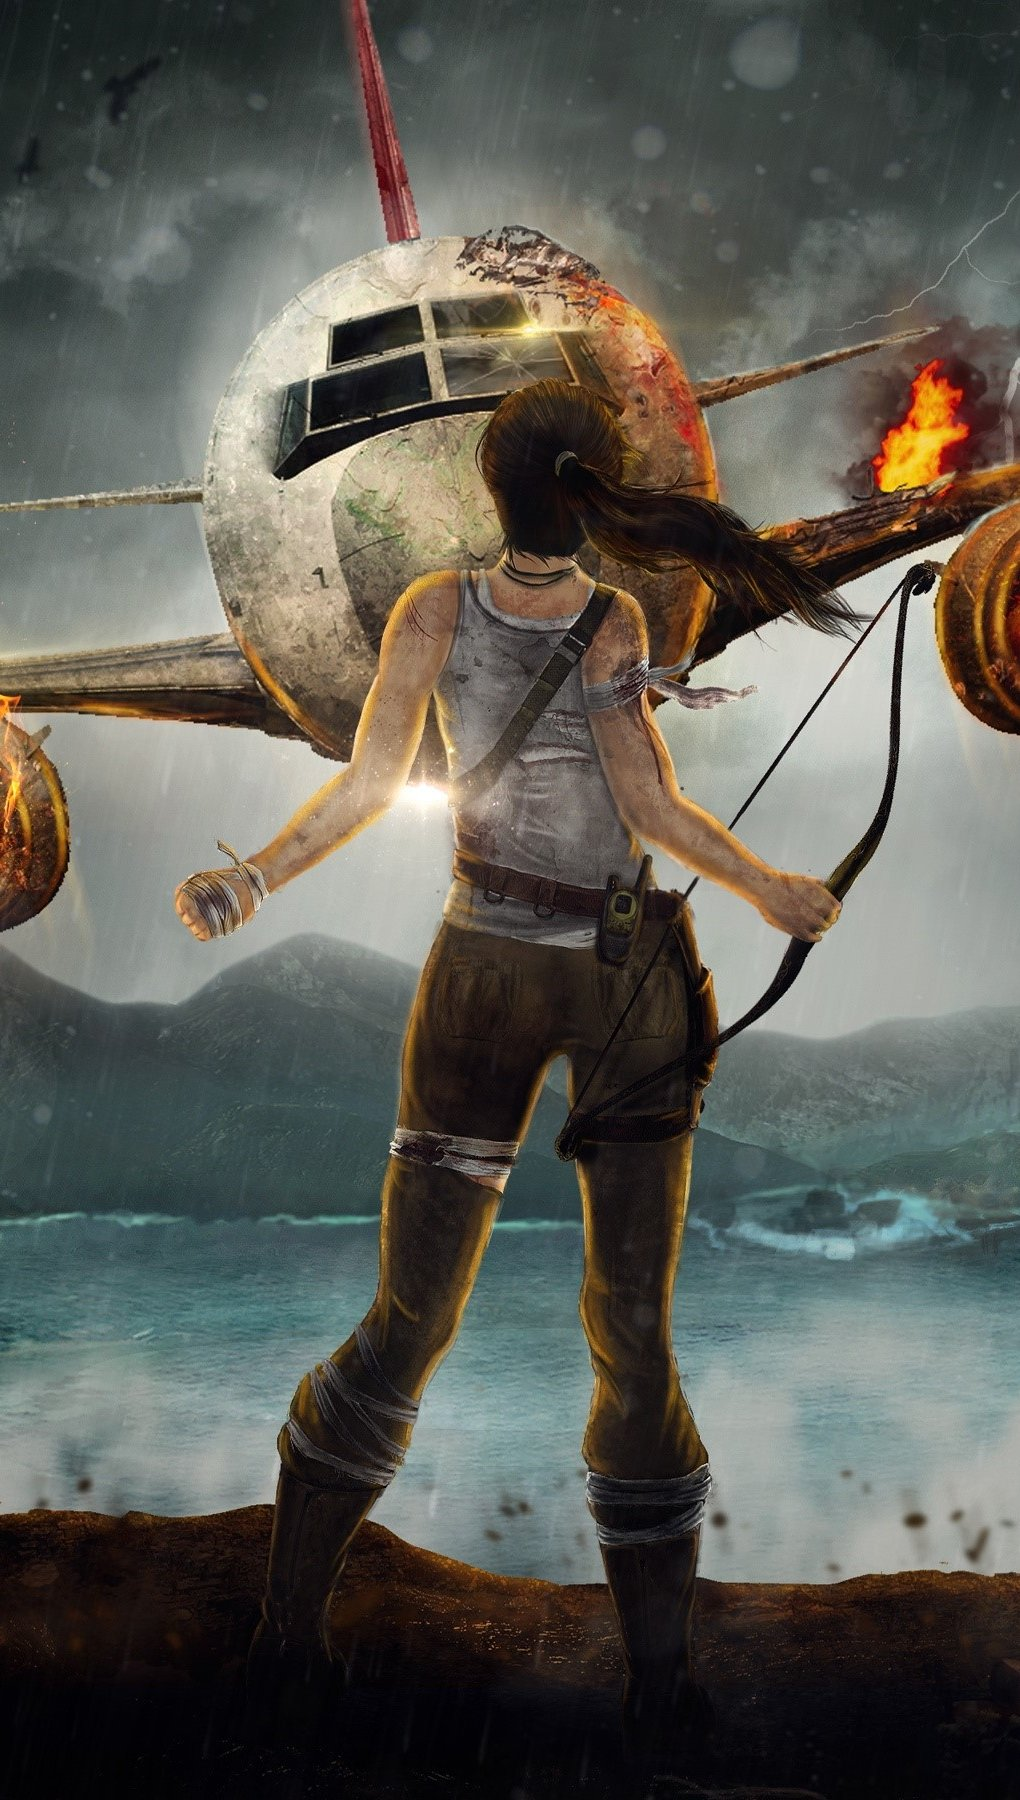 Wallpaper The adventure of Lara Croft Vertical